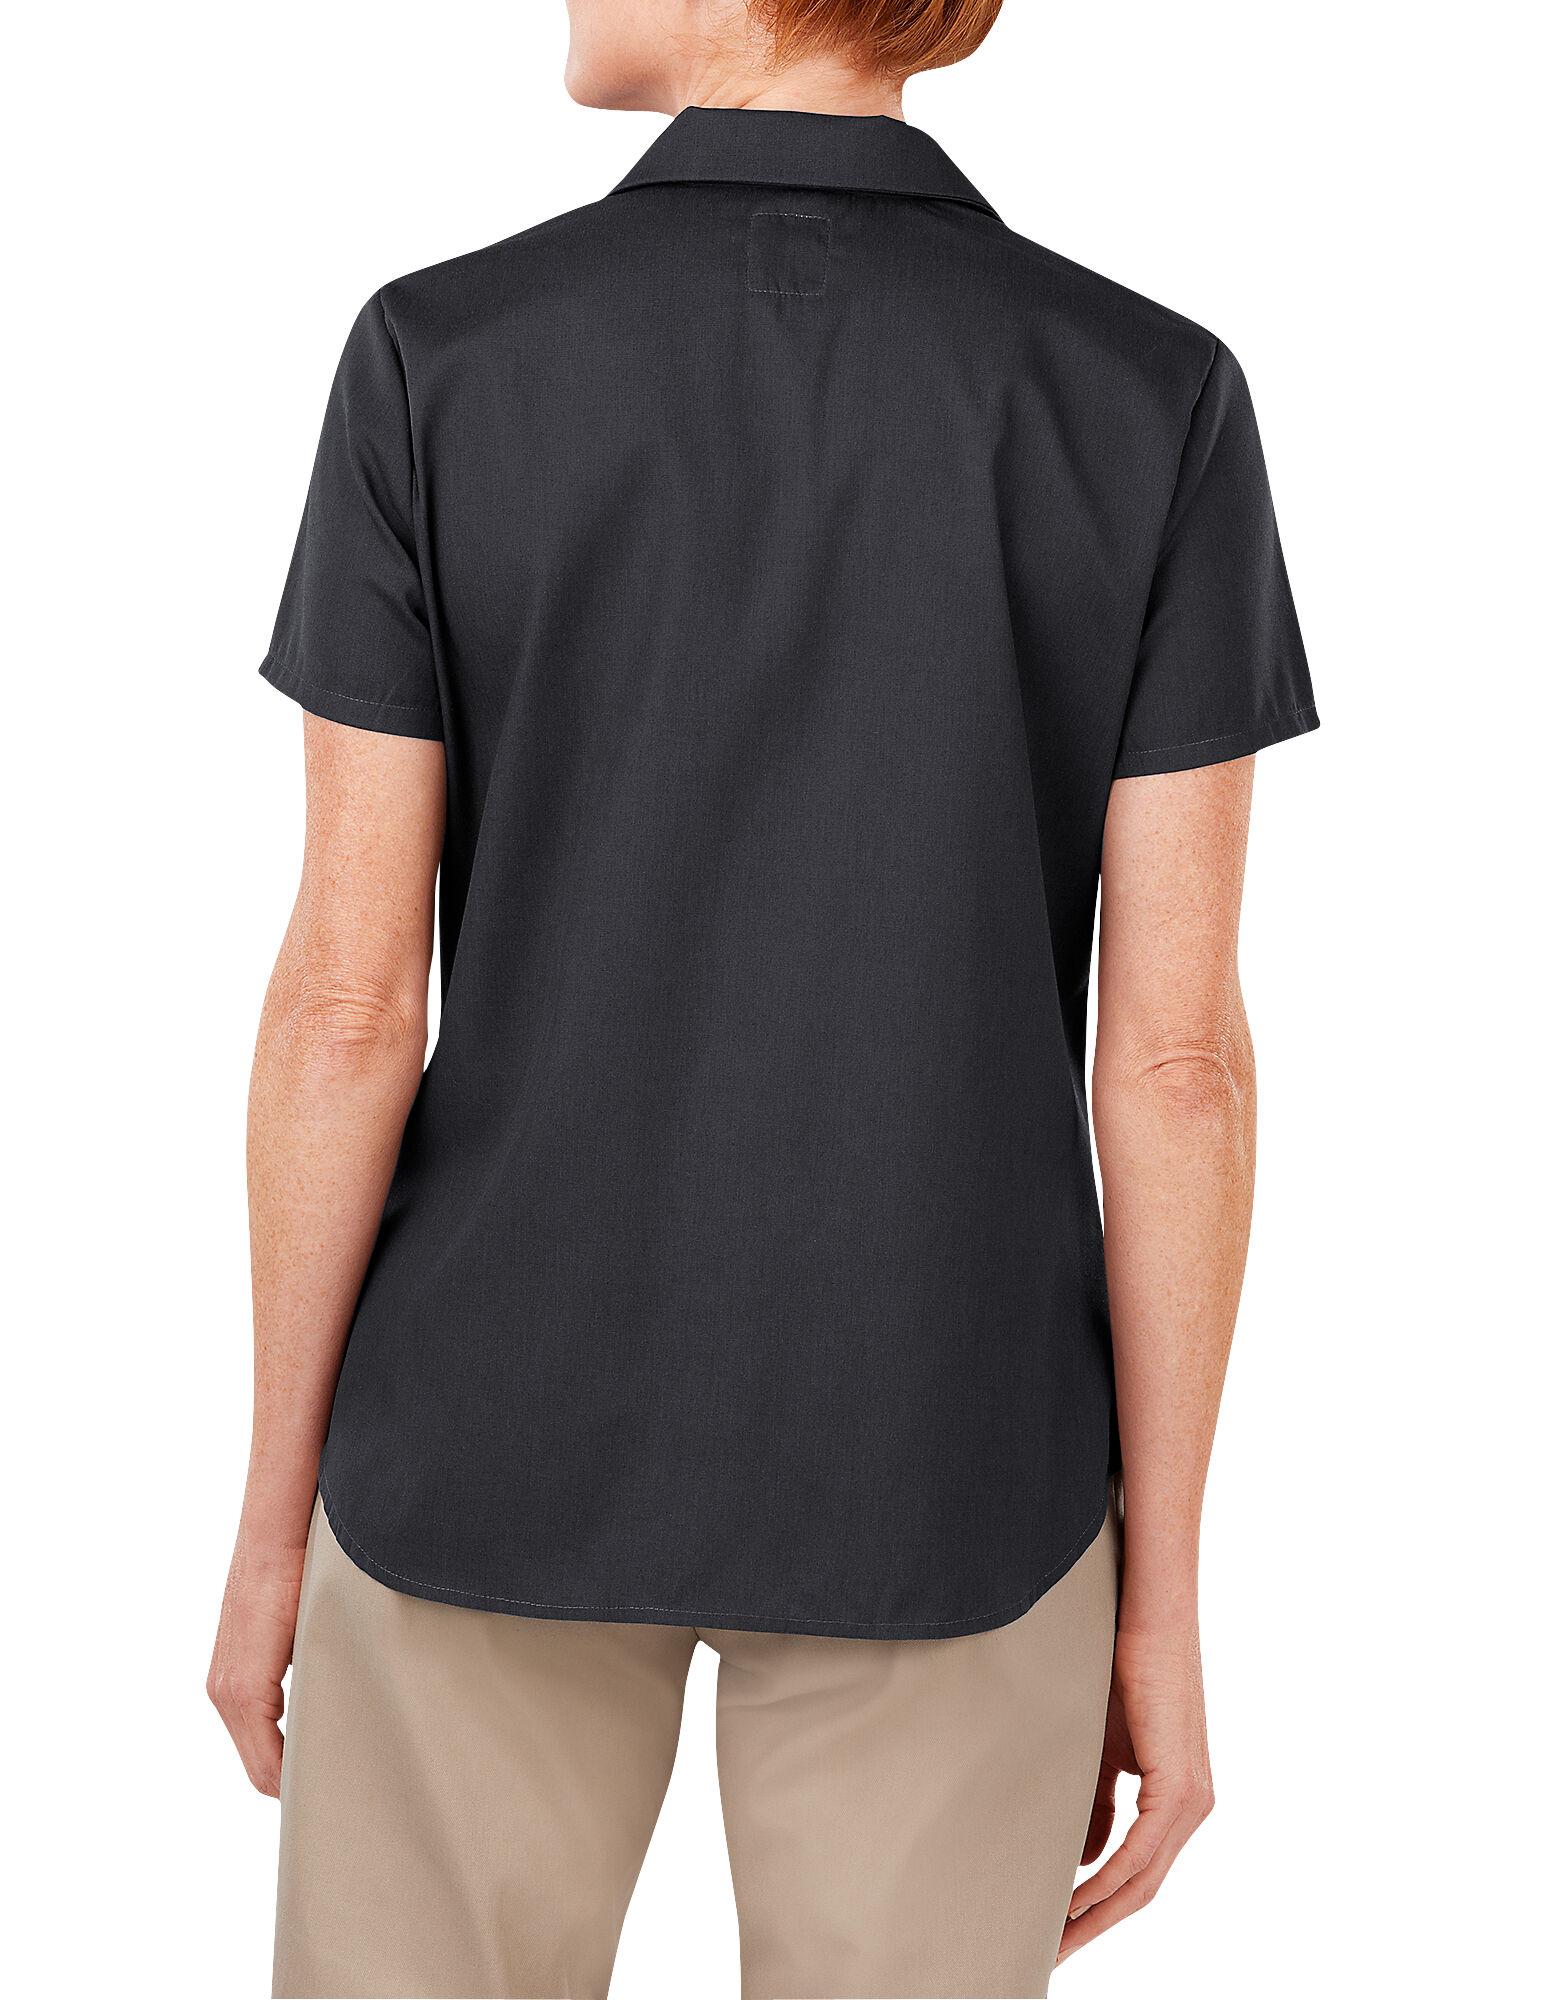 Red Kap Shirts: Men's SP24 BK Black Industrial Short-Sleeve Poplin Work Shirt